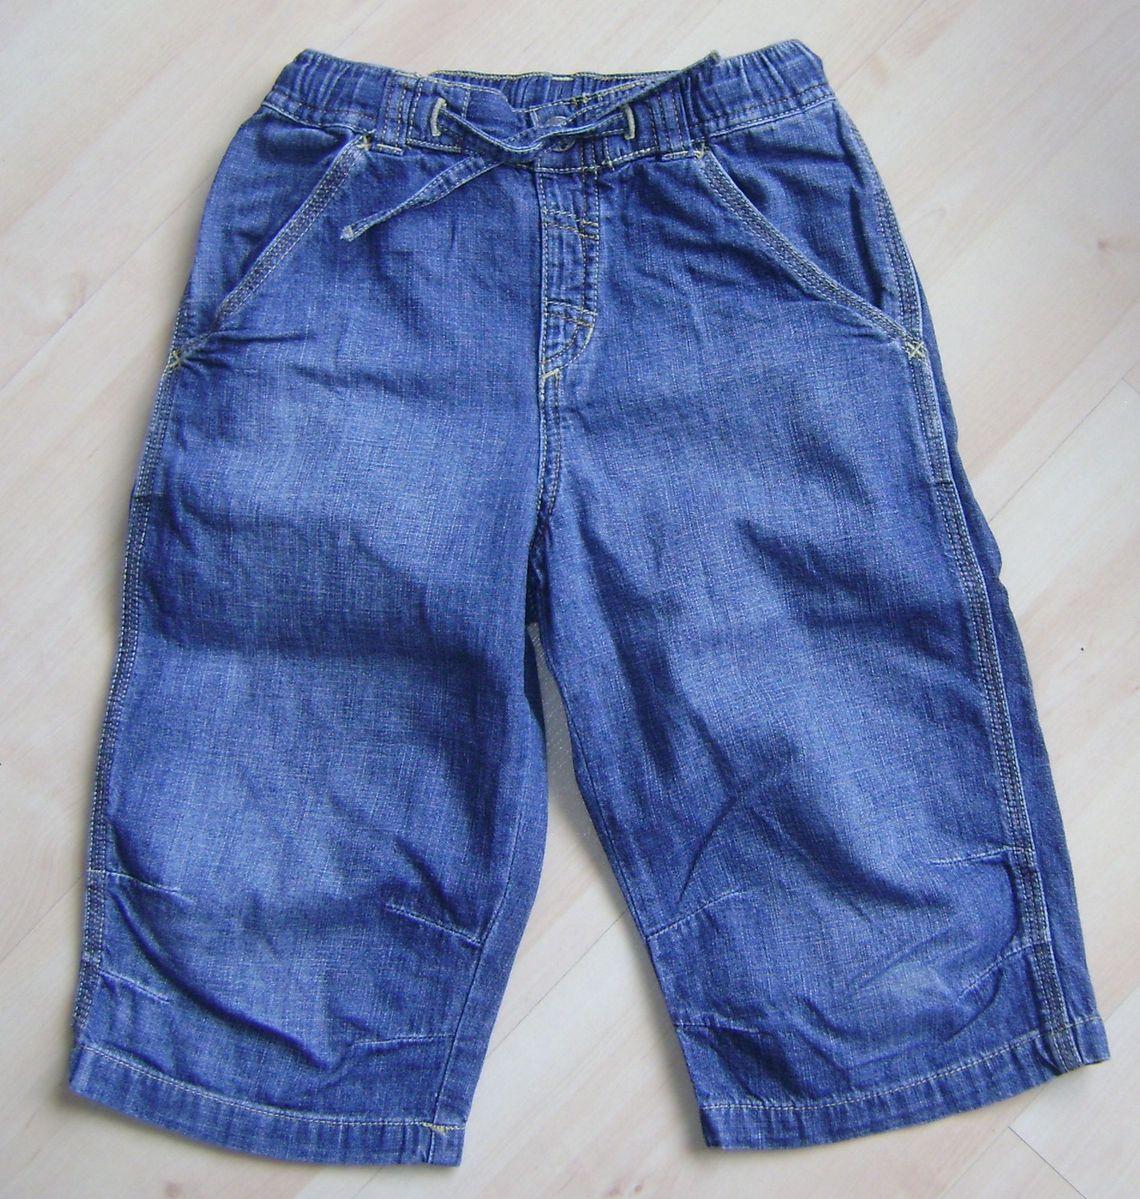 Ubranka na lato dla chłopca roz 122 - 128